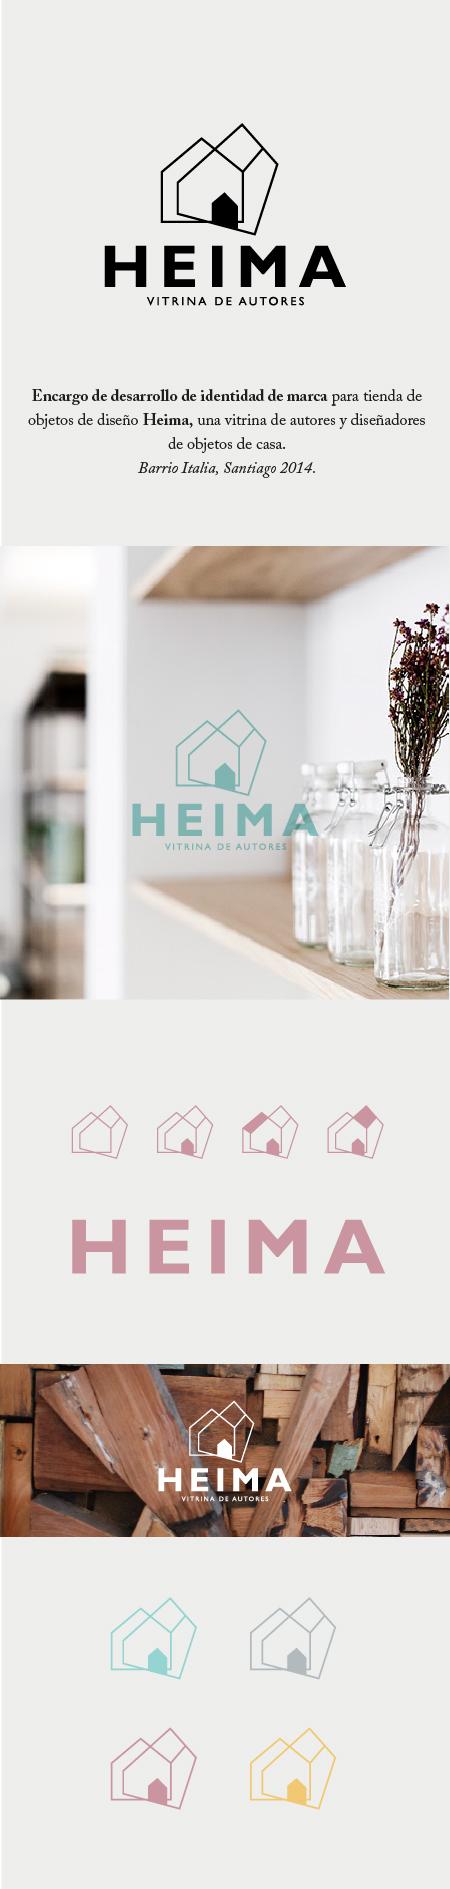 identidad de marca heima